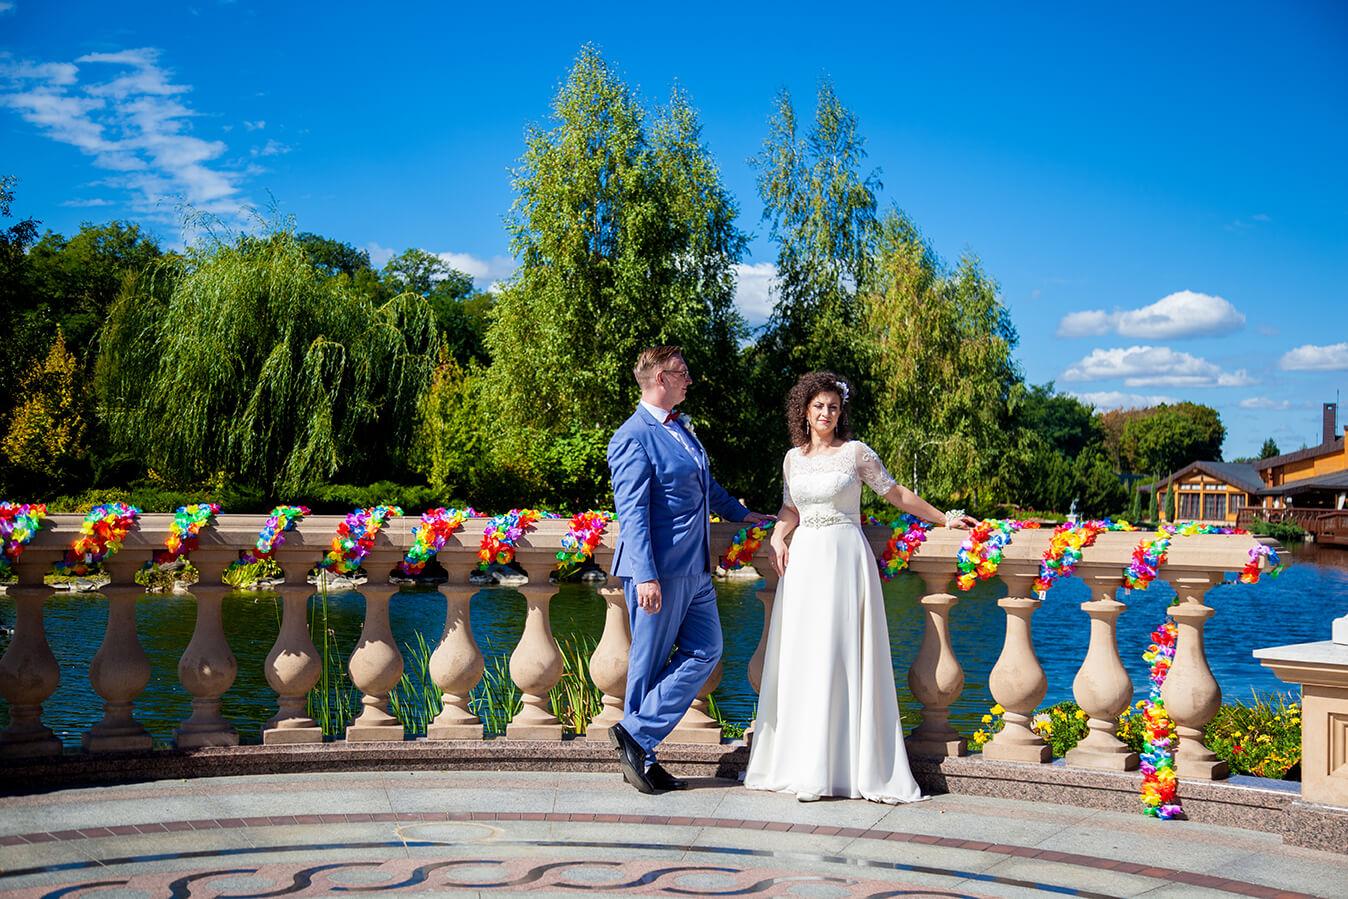 3-svadebnyj-fotograf-videooperator-svadebnoe-foto-idei-kiev-31